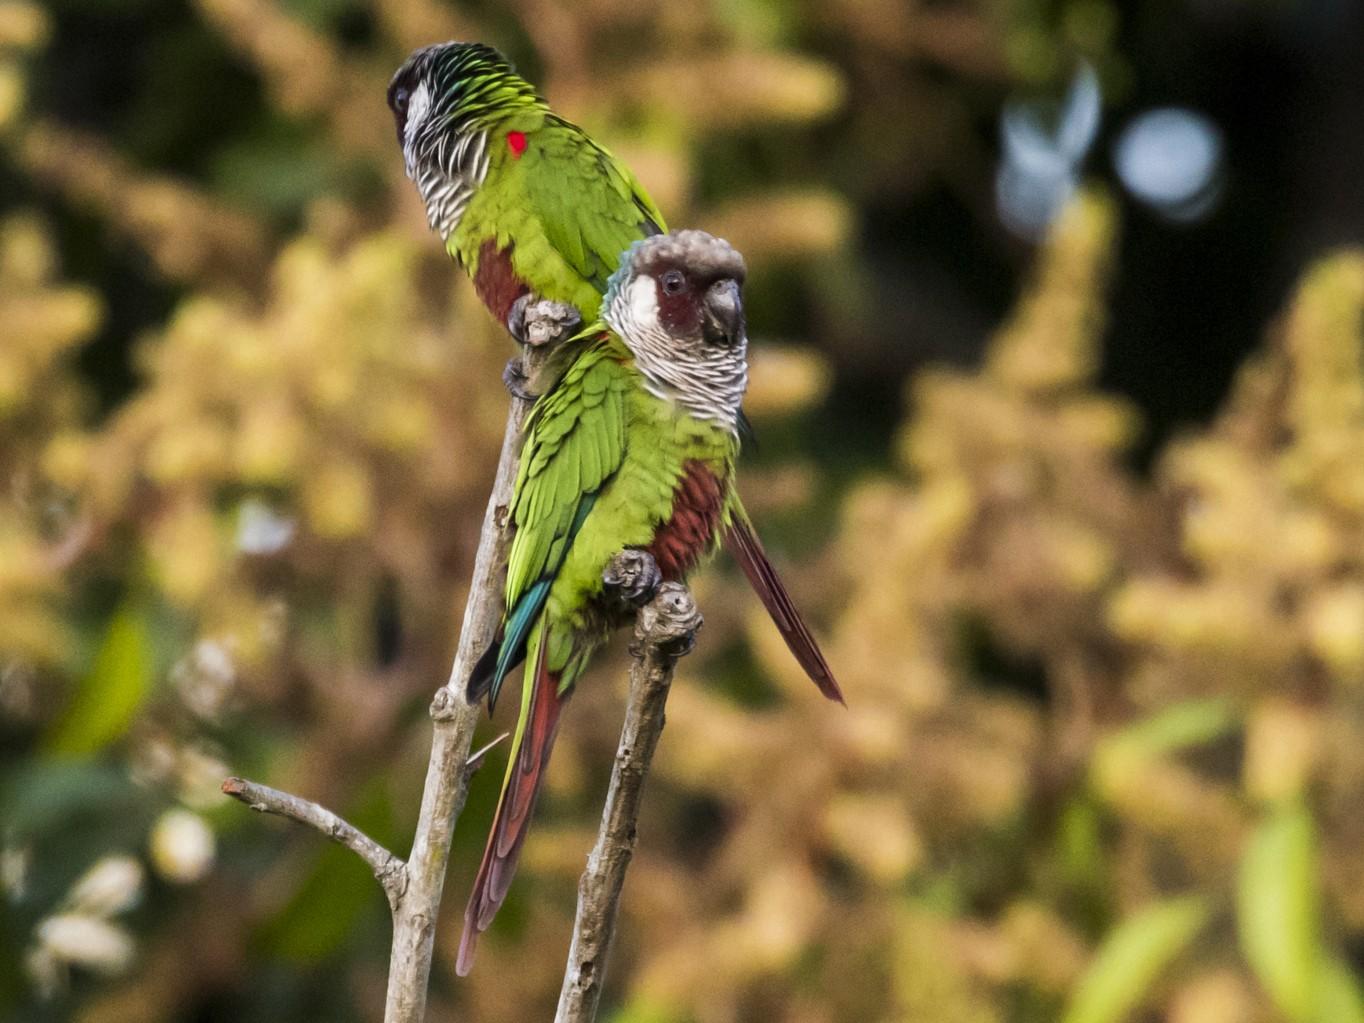 Gray-breasted Parakeet - Claudia Brasileiro